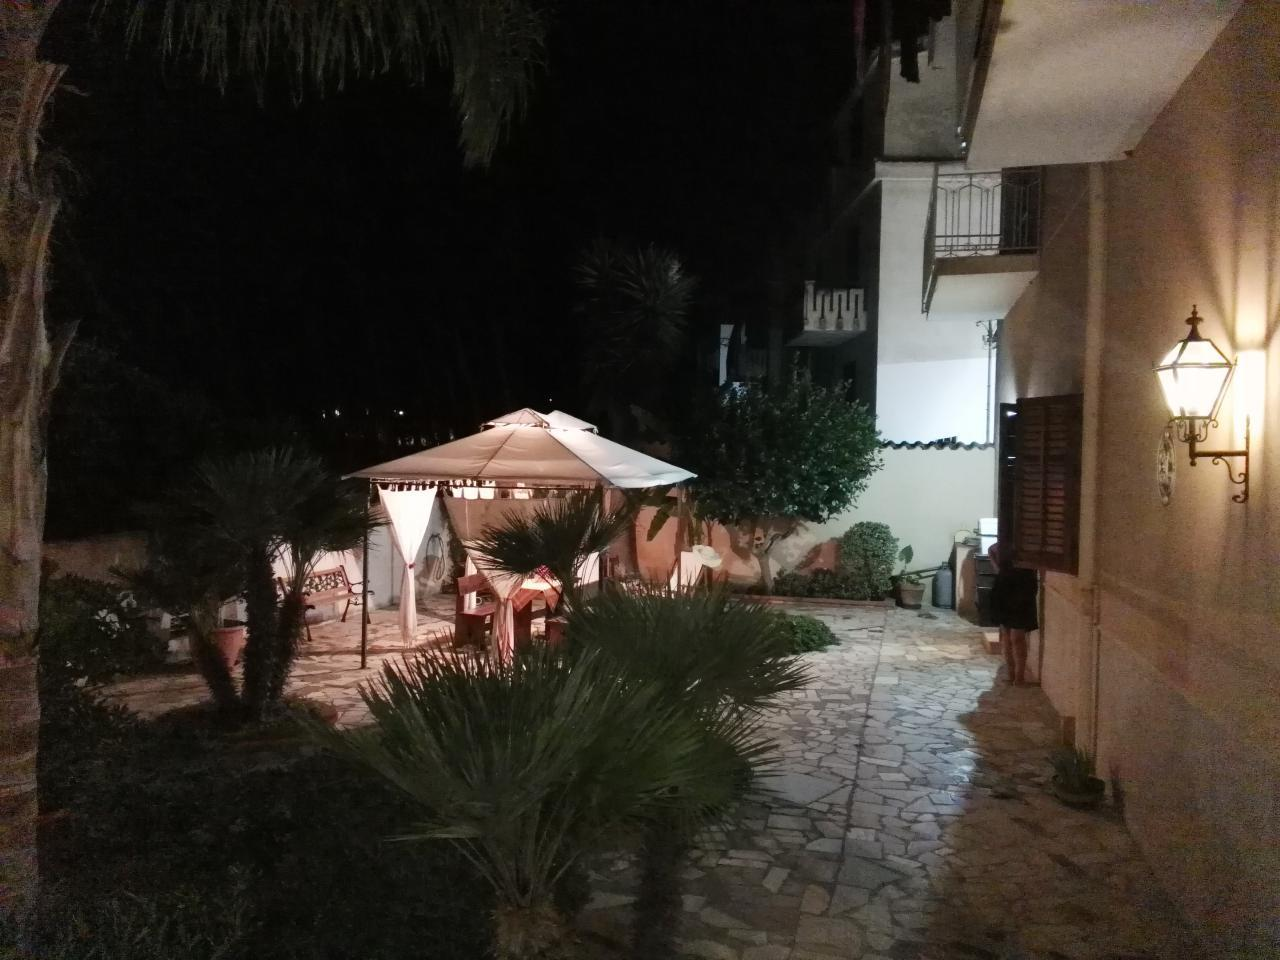 Maison de vacances Castellammare del Golfo Villalba A (34542), Castellammare del Golfo, Trapani, Sicile, Italie, image 19